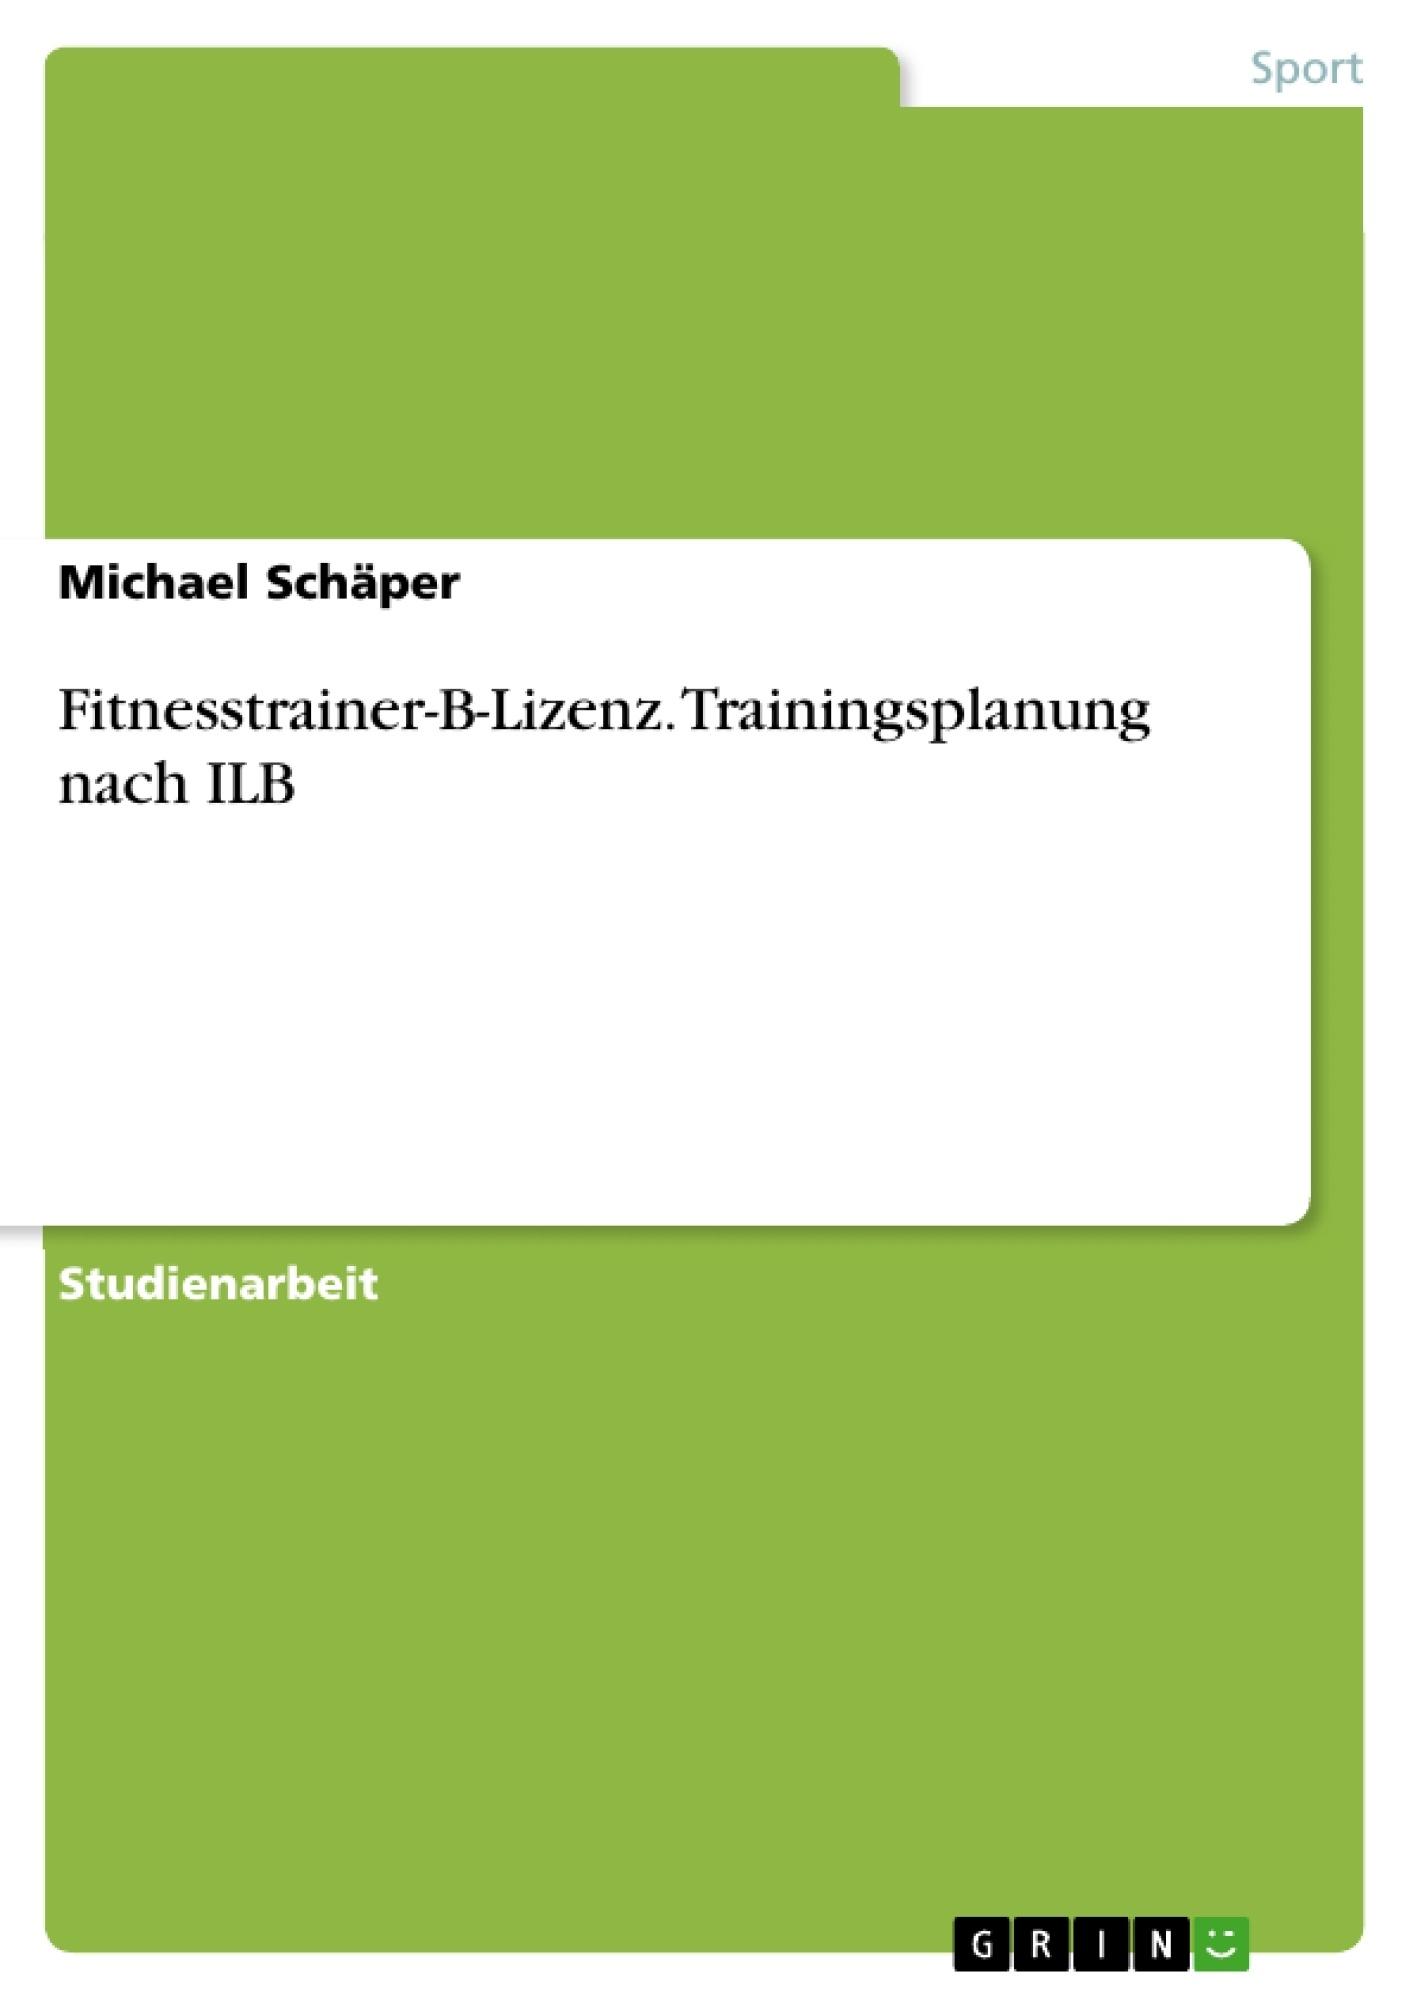 Titel: Fitnesstrainer-B-Lizenz. Trainingsplanung nach ILB